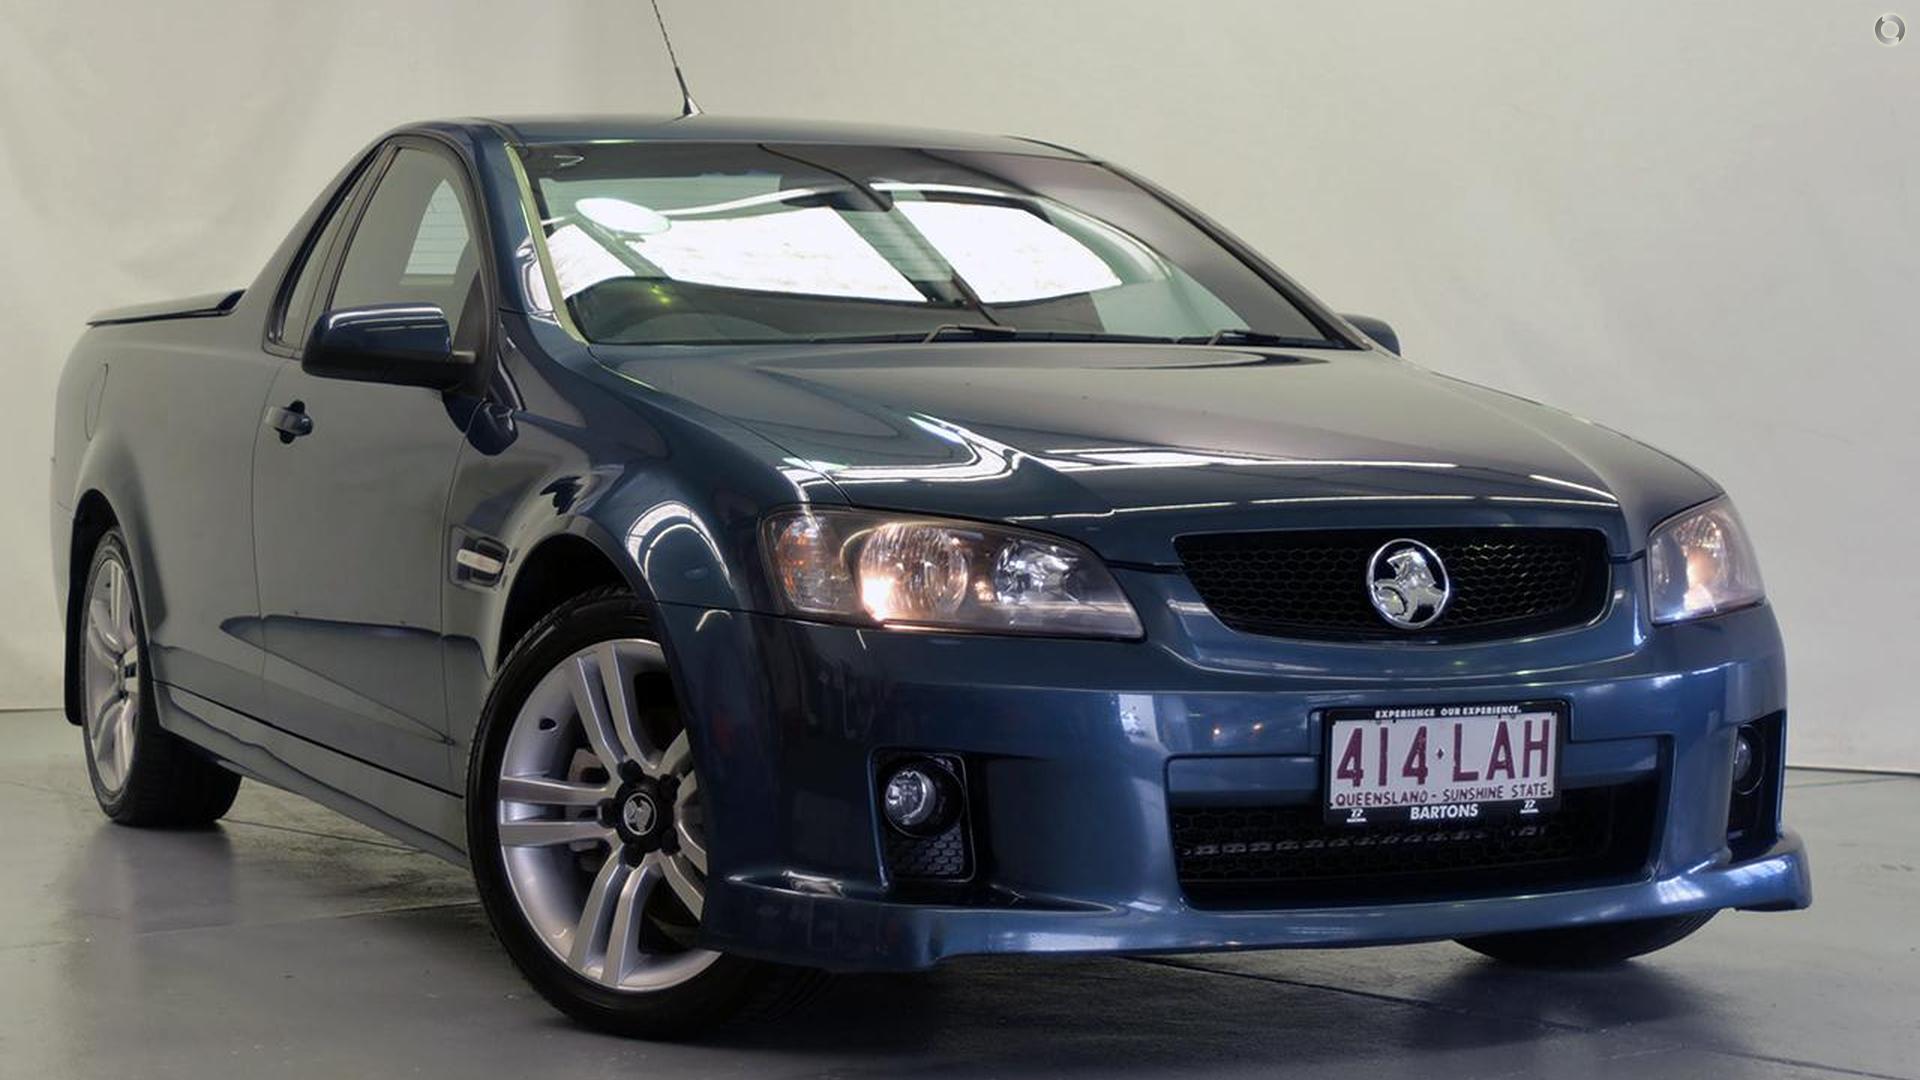 2008 Holden Ute Sv6 60th Anniversary